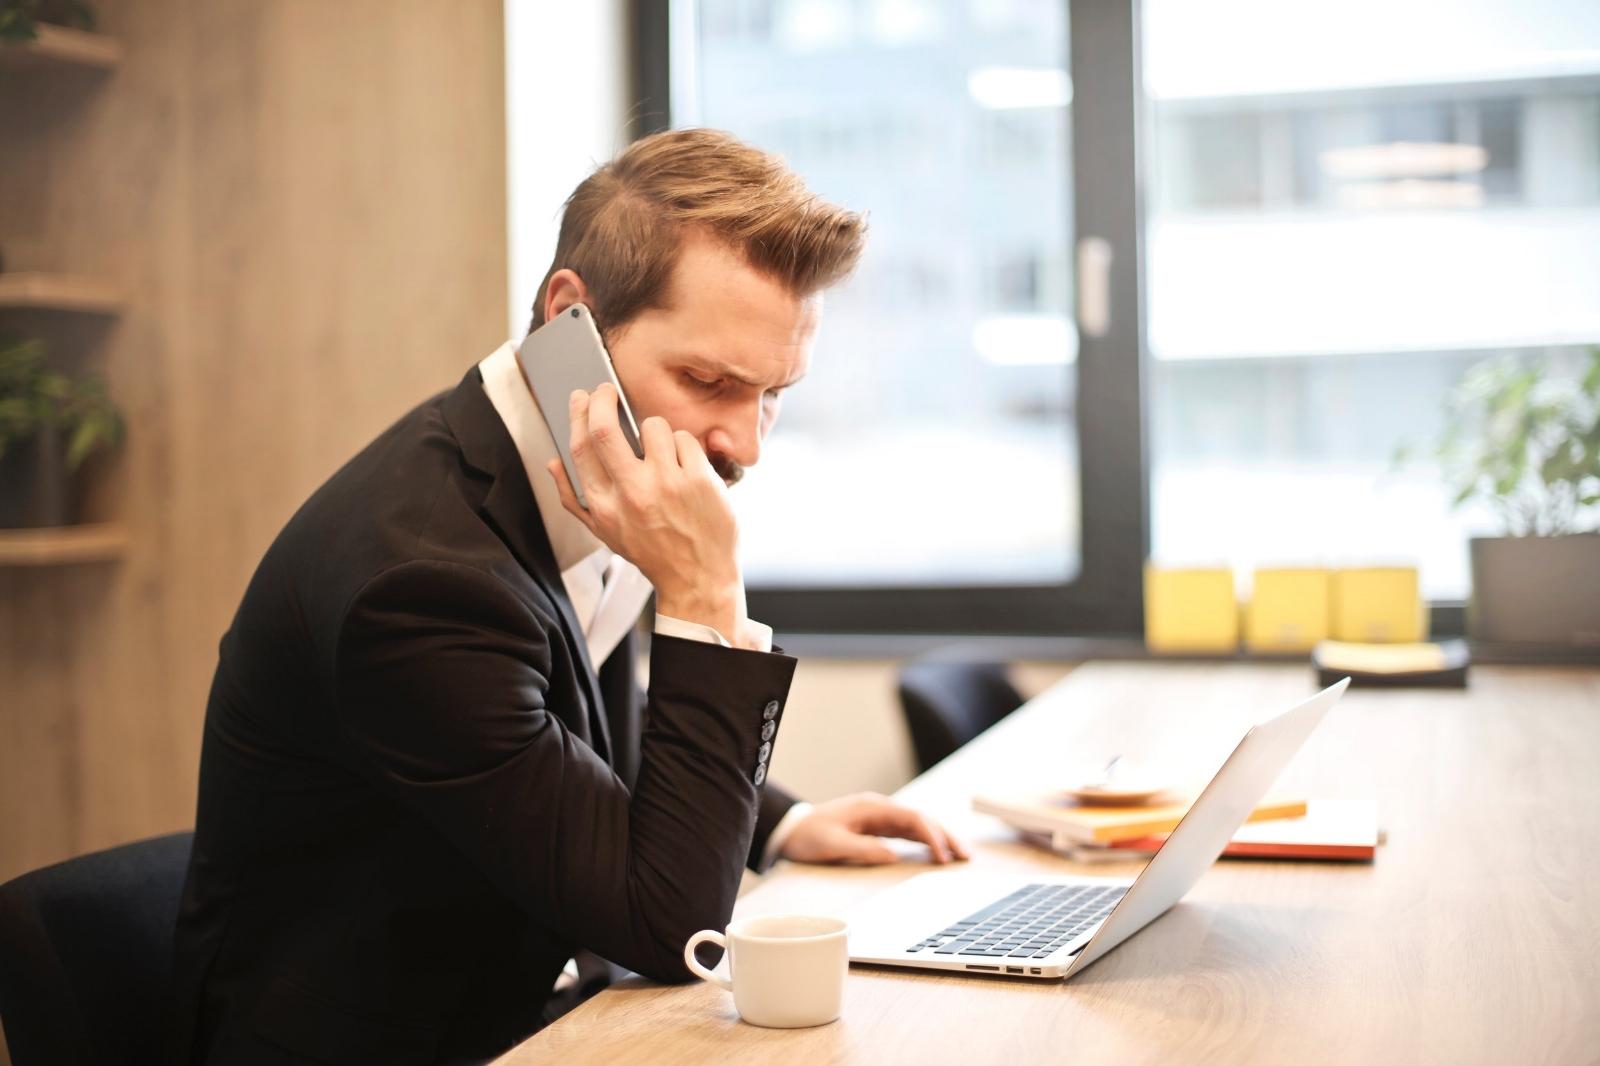 calling-cellphone-communication-859264.jpg